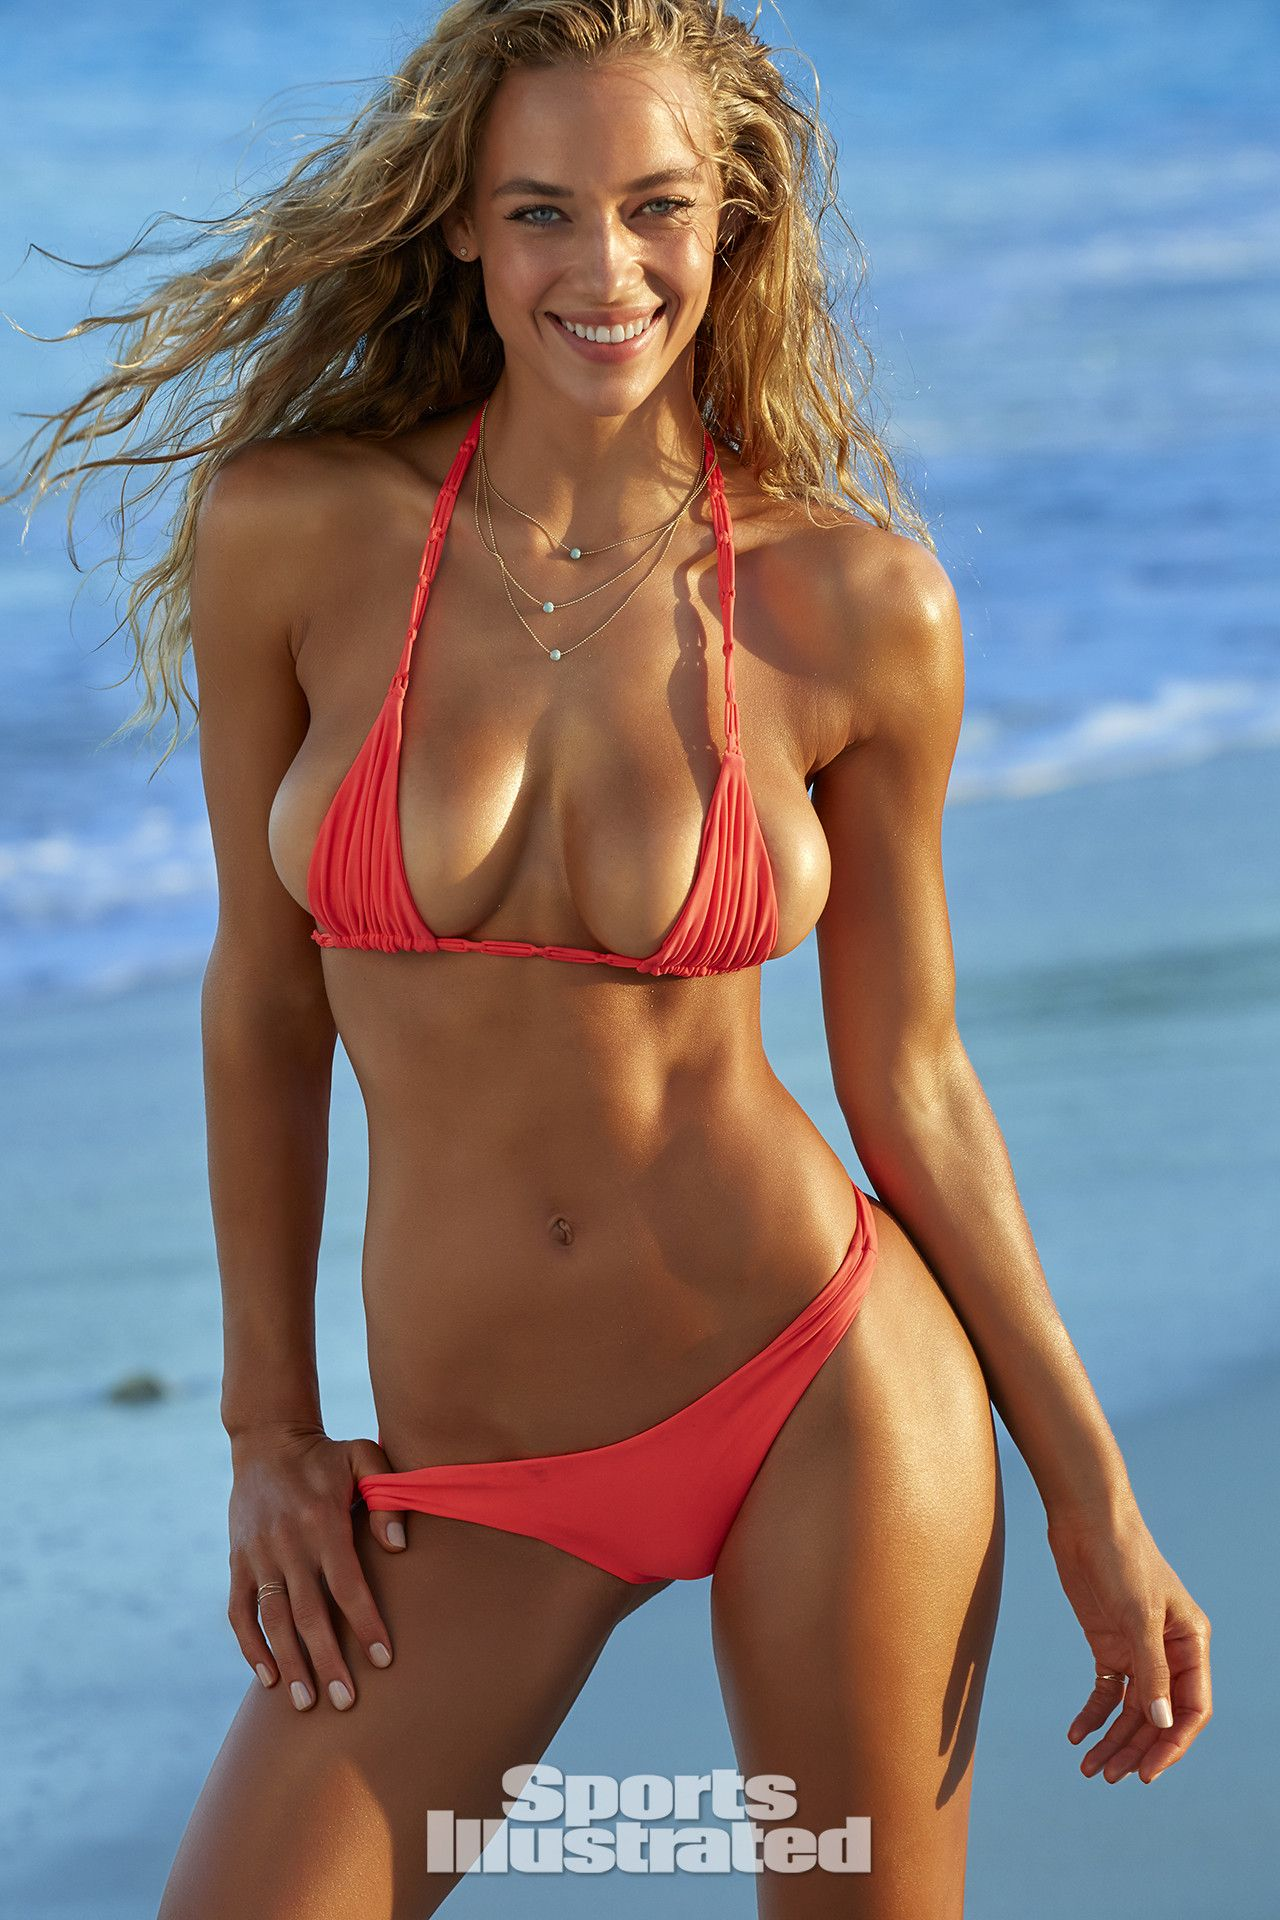 Multiple Sizes Hannah Ferguson SI Swimsuit Model Sports Illustrated Bikini #1